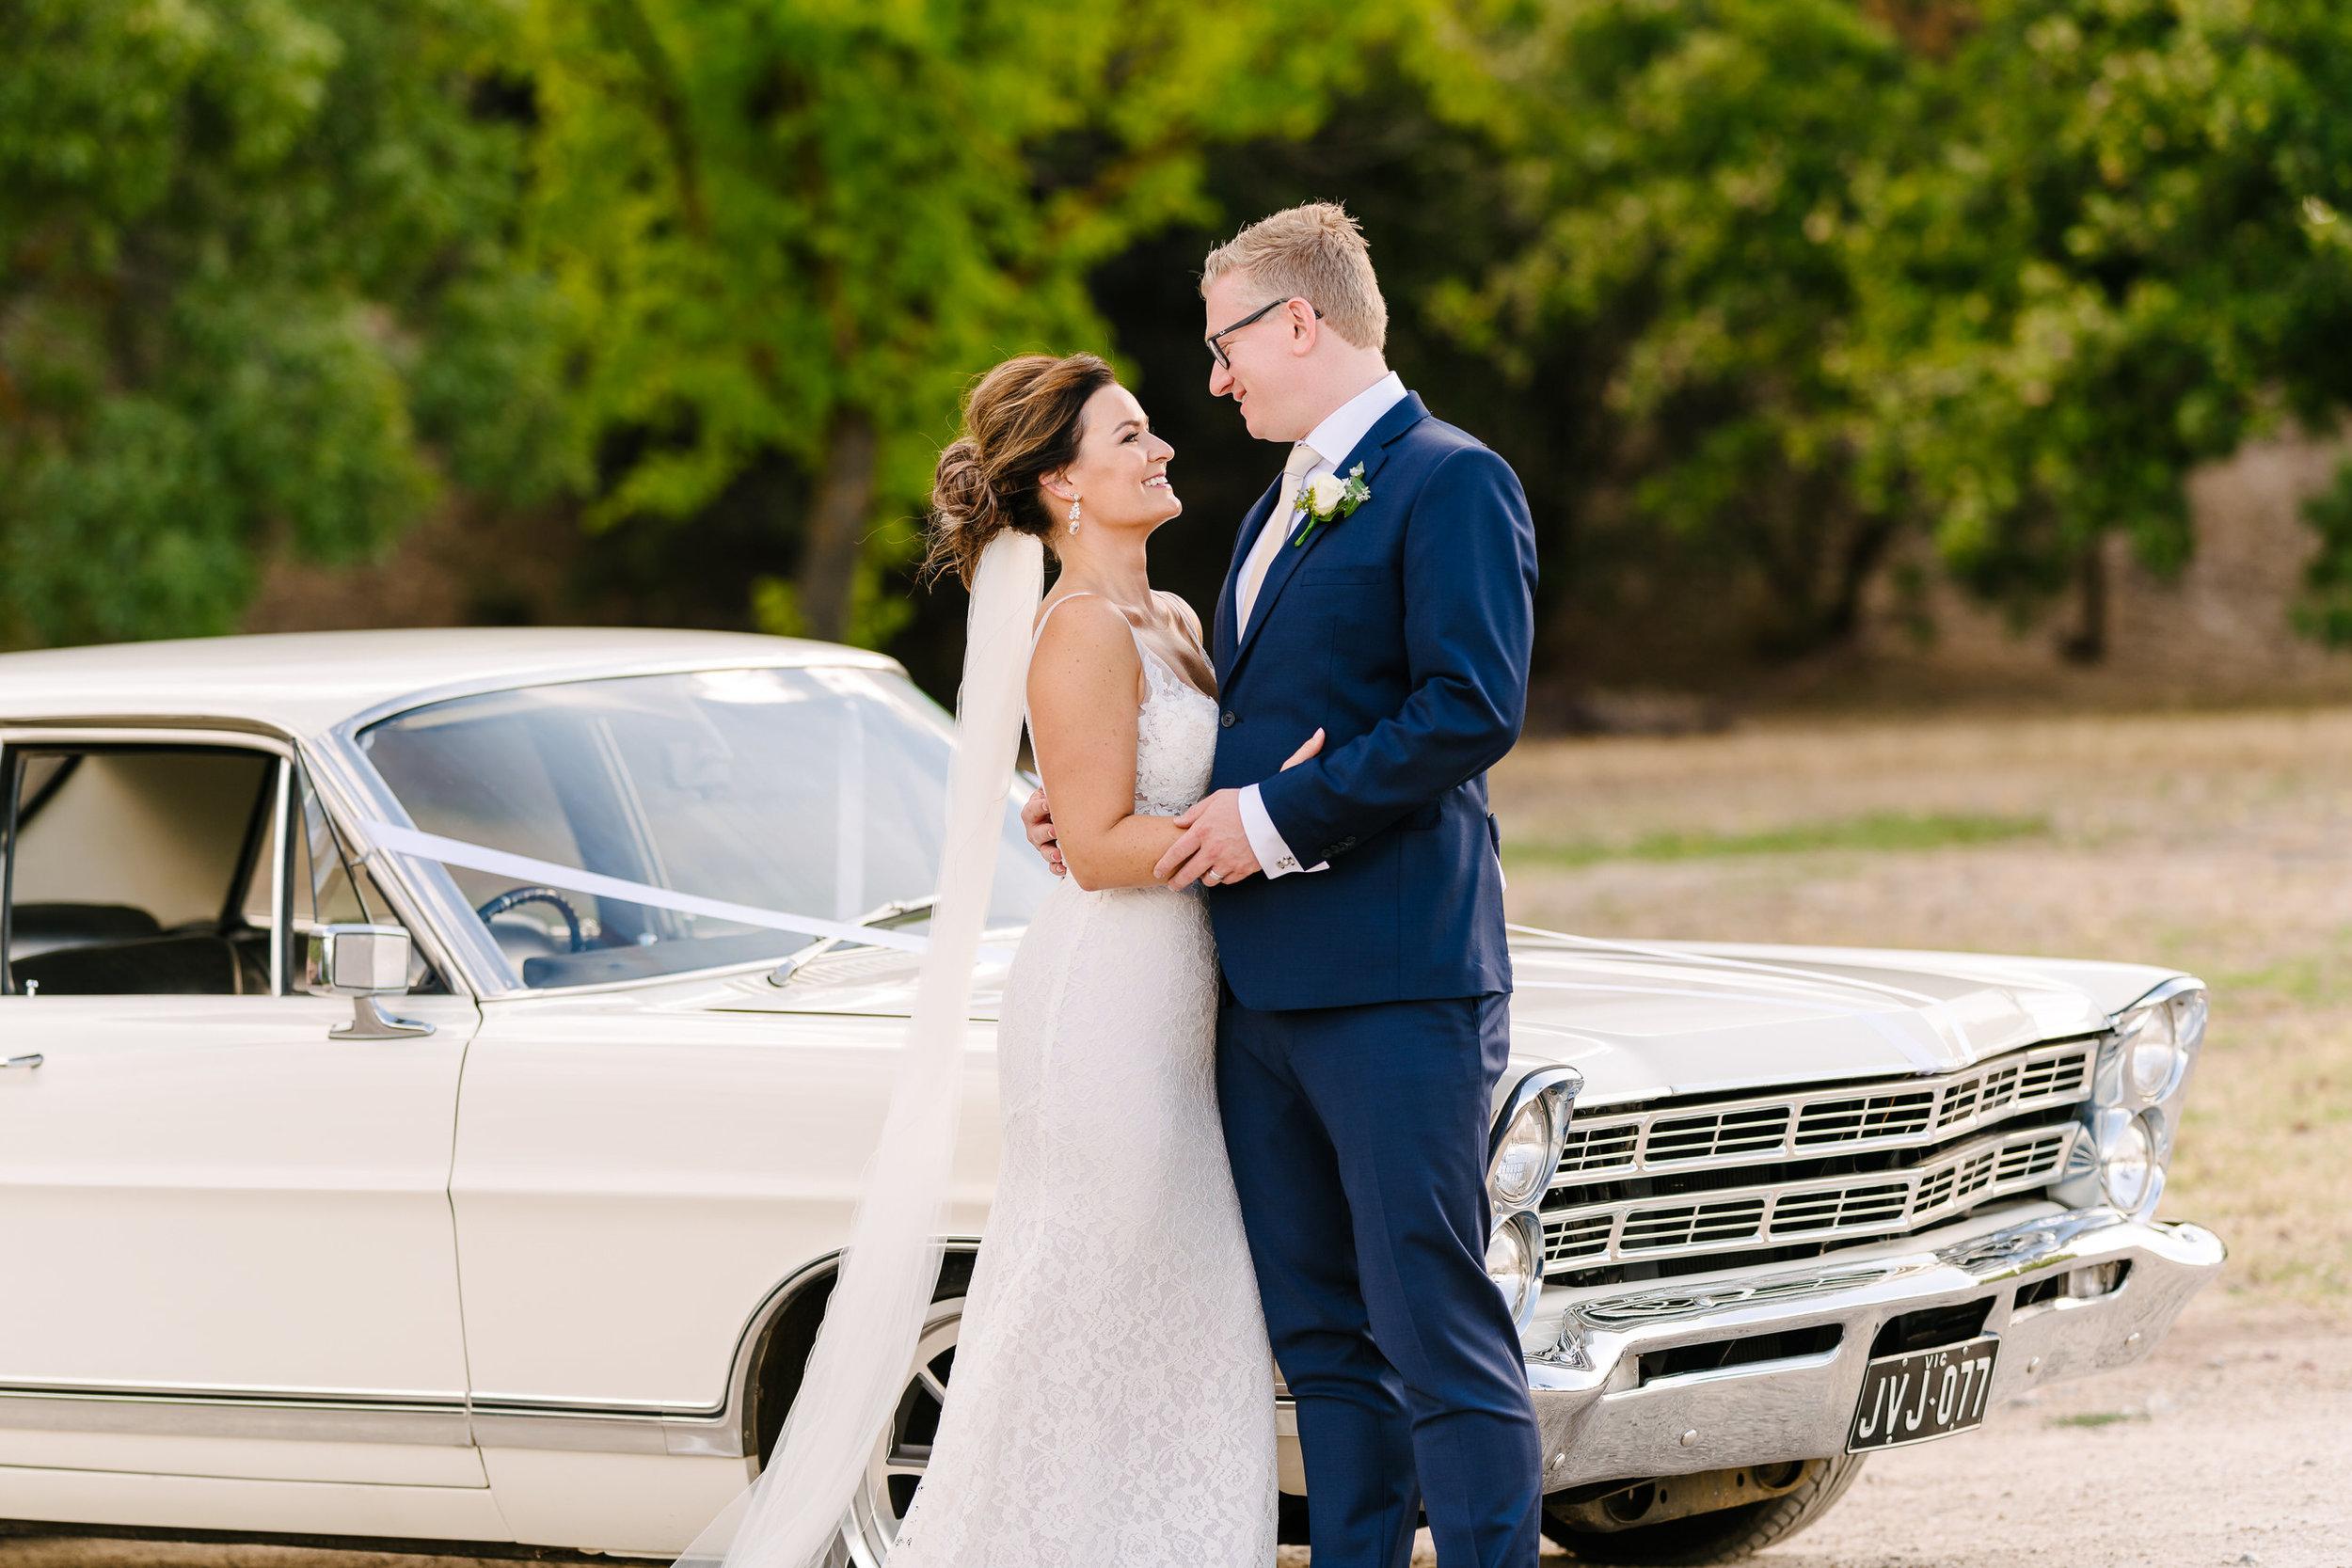 Justin_And_Jim_Photography_Chateau_Dore_Bendigo_Wedding74.JPG